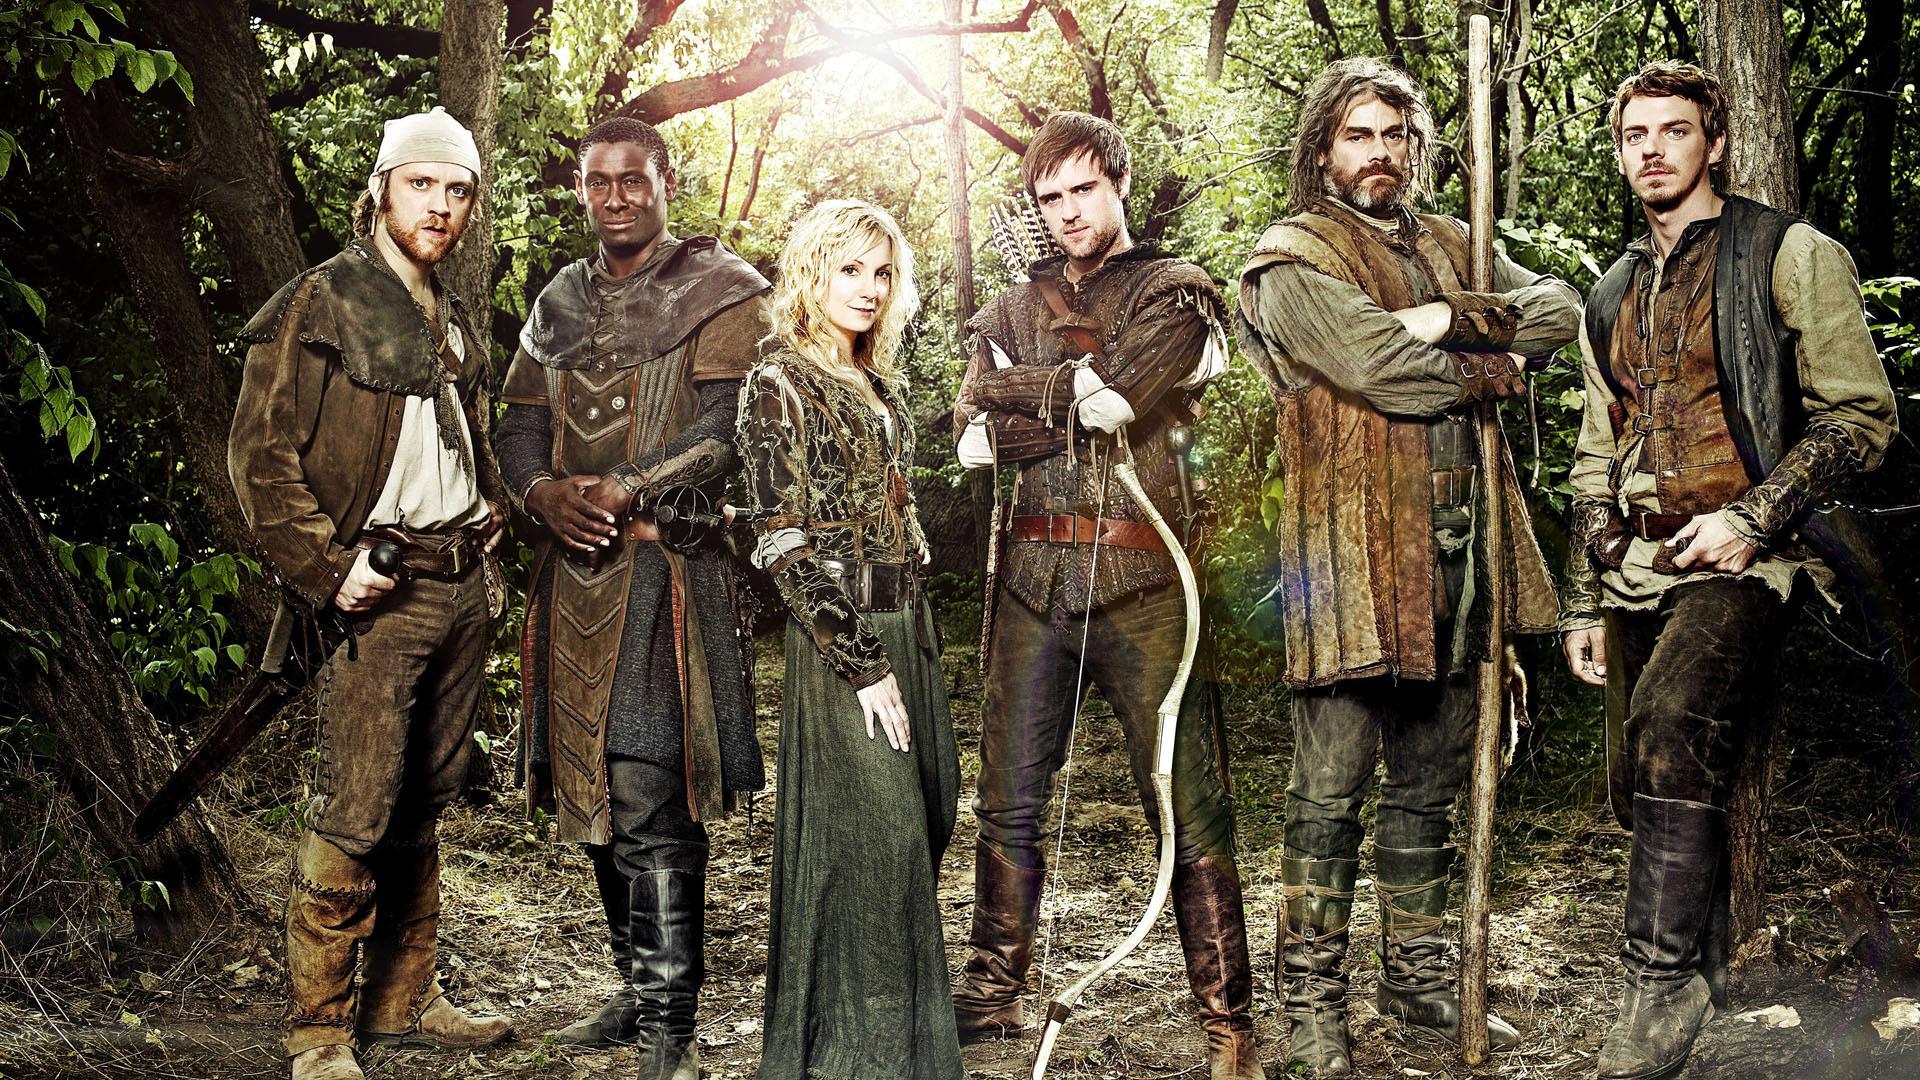 Show Robin Hood